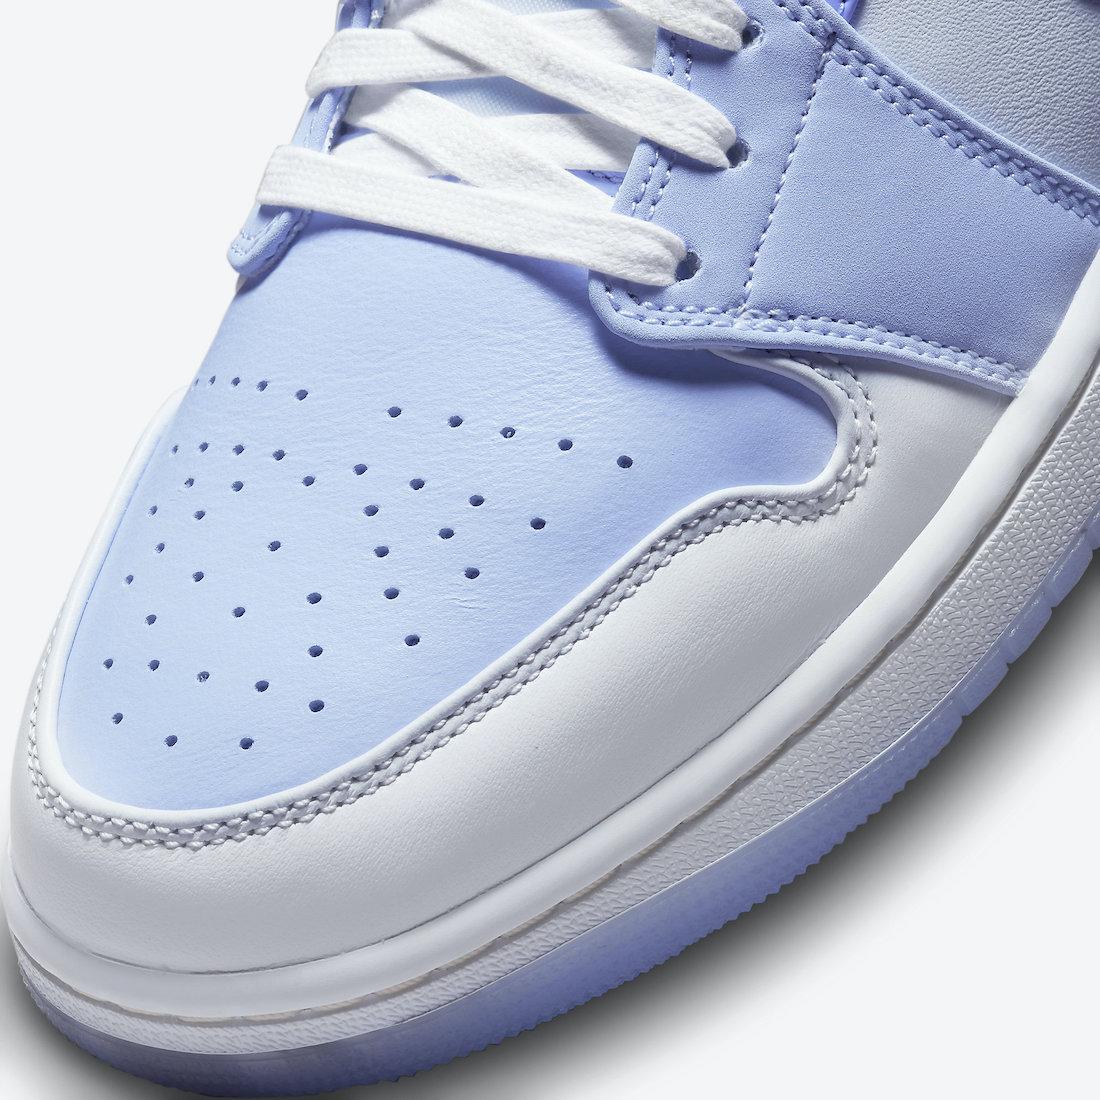 Air-Jordan-1-Low-Mighty-Swooshers-DM5442-040-Release-Date-6